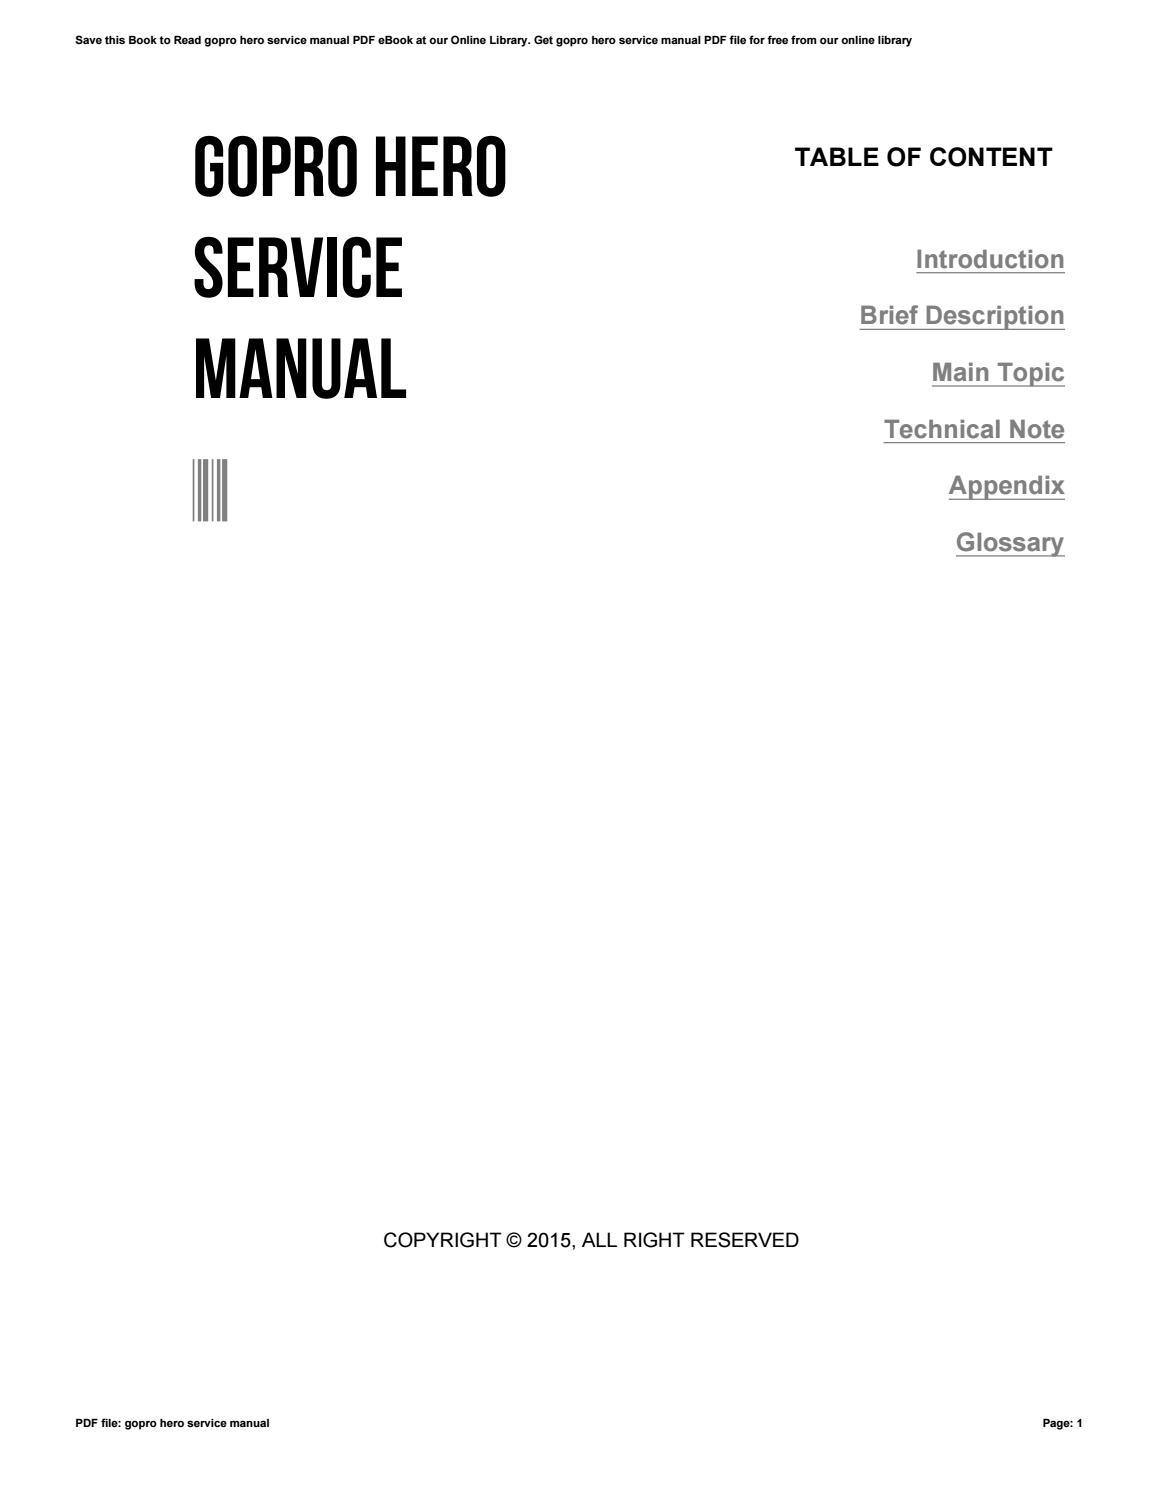 yamaha thr10x manual ebook